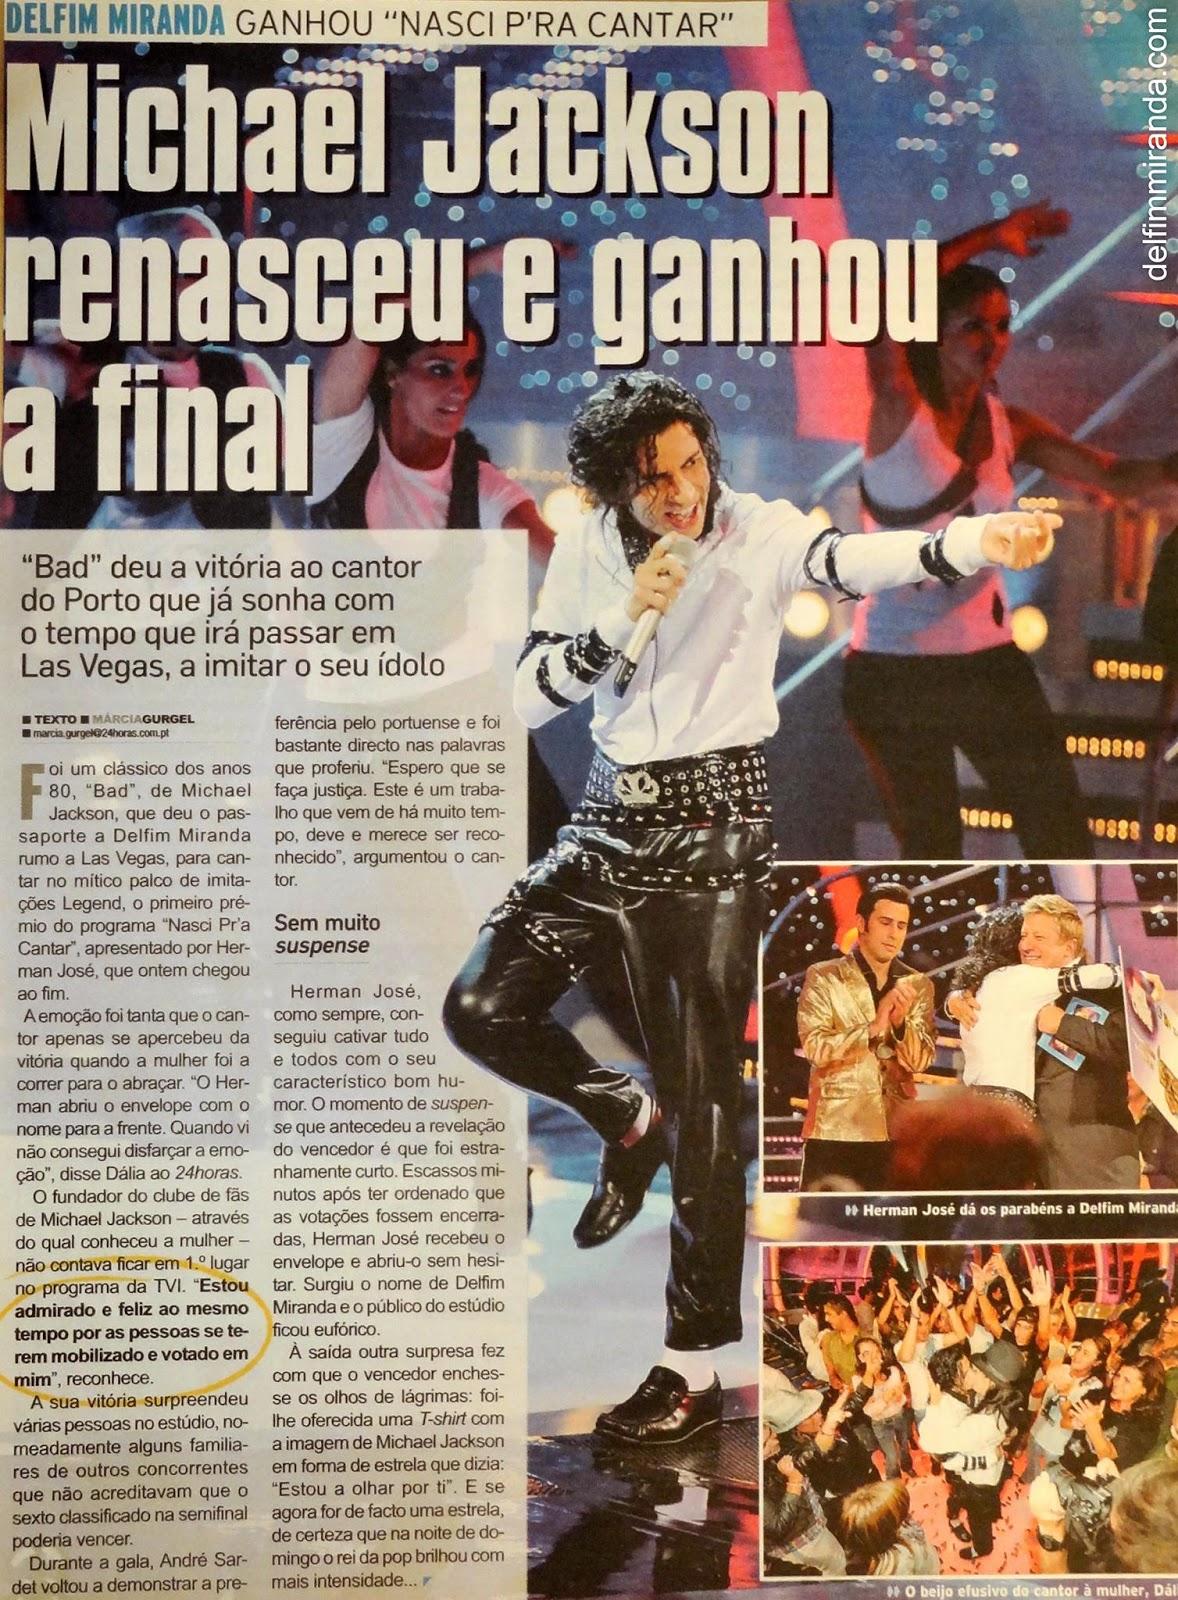 Delfim Miranda - Michael Jackson Tribute - Newspaper 24hours - Michael Jackson was reborn and won the finals